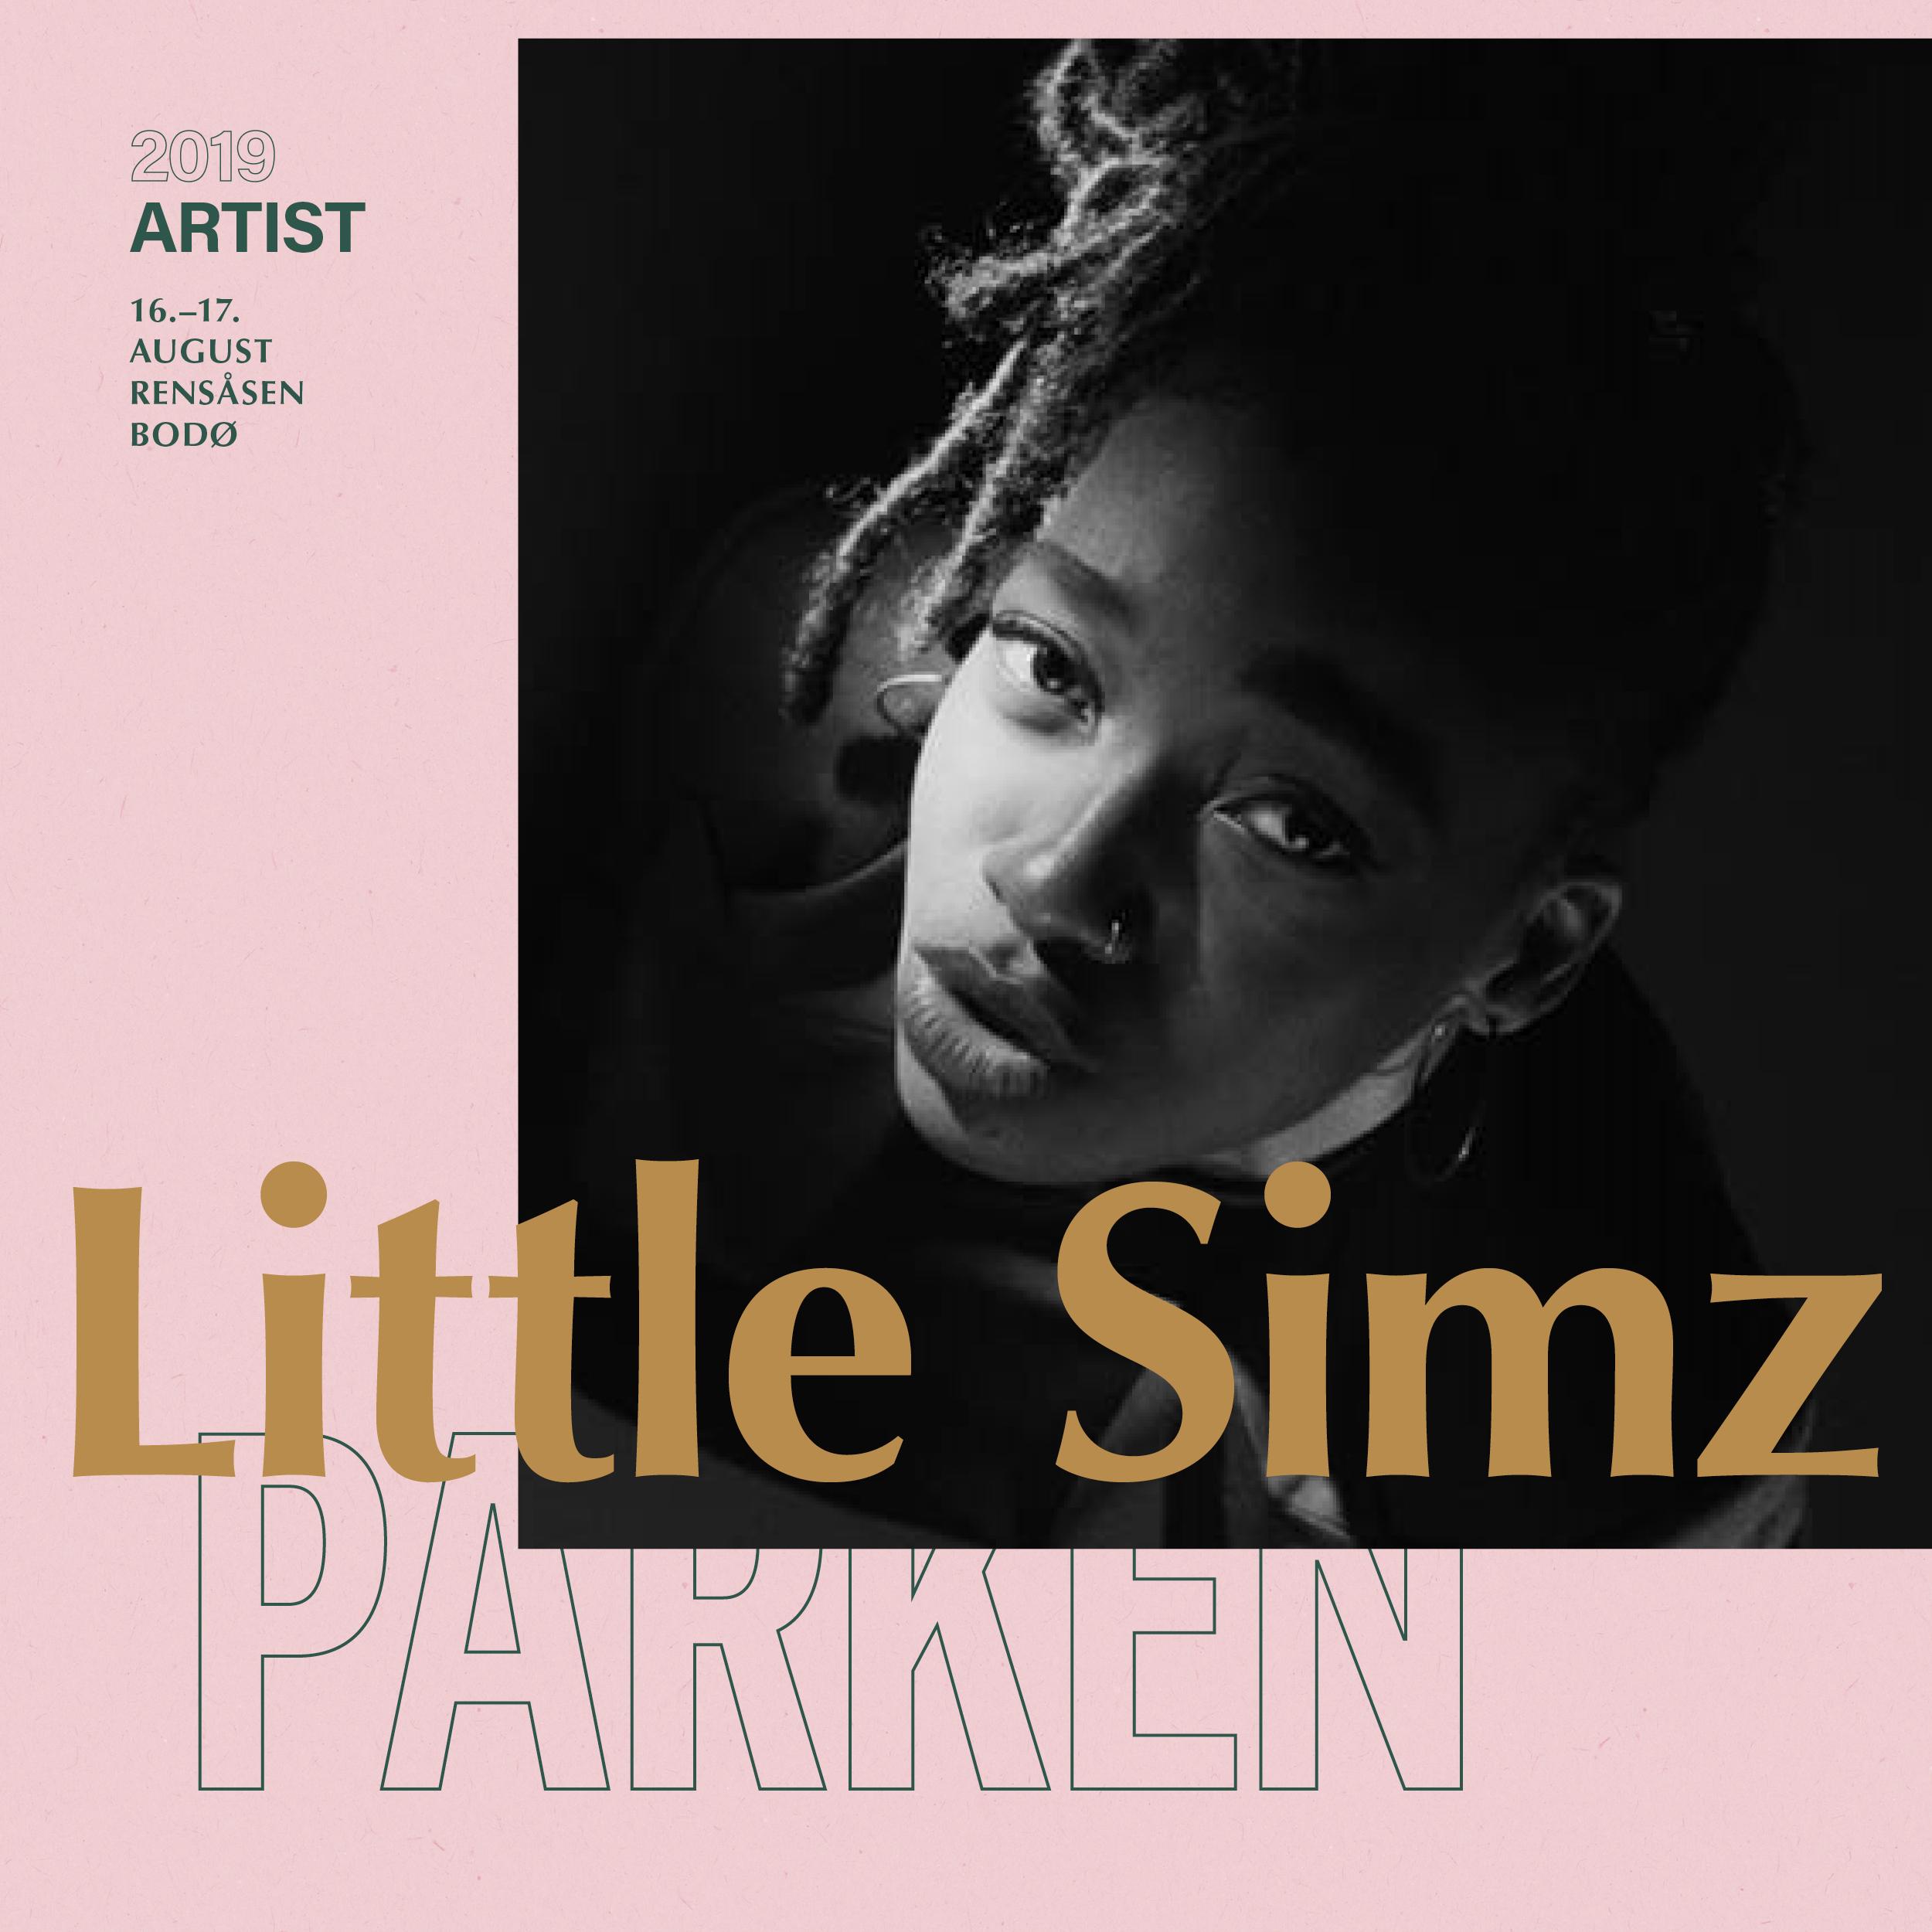 BYRAA_Parken_Artistslipp_2019_Little_Simz_1200x1200px.jpg